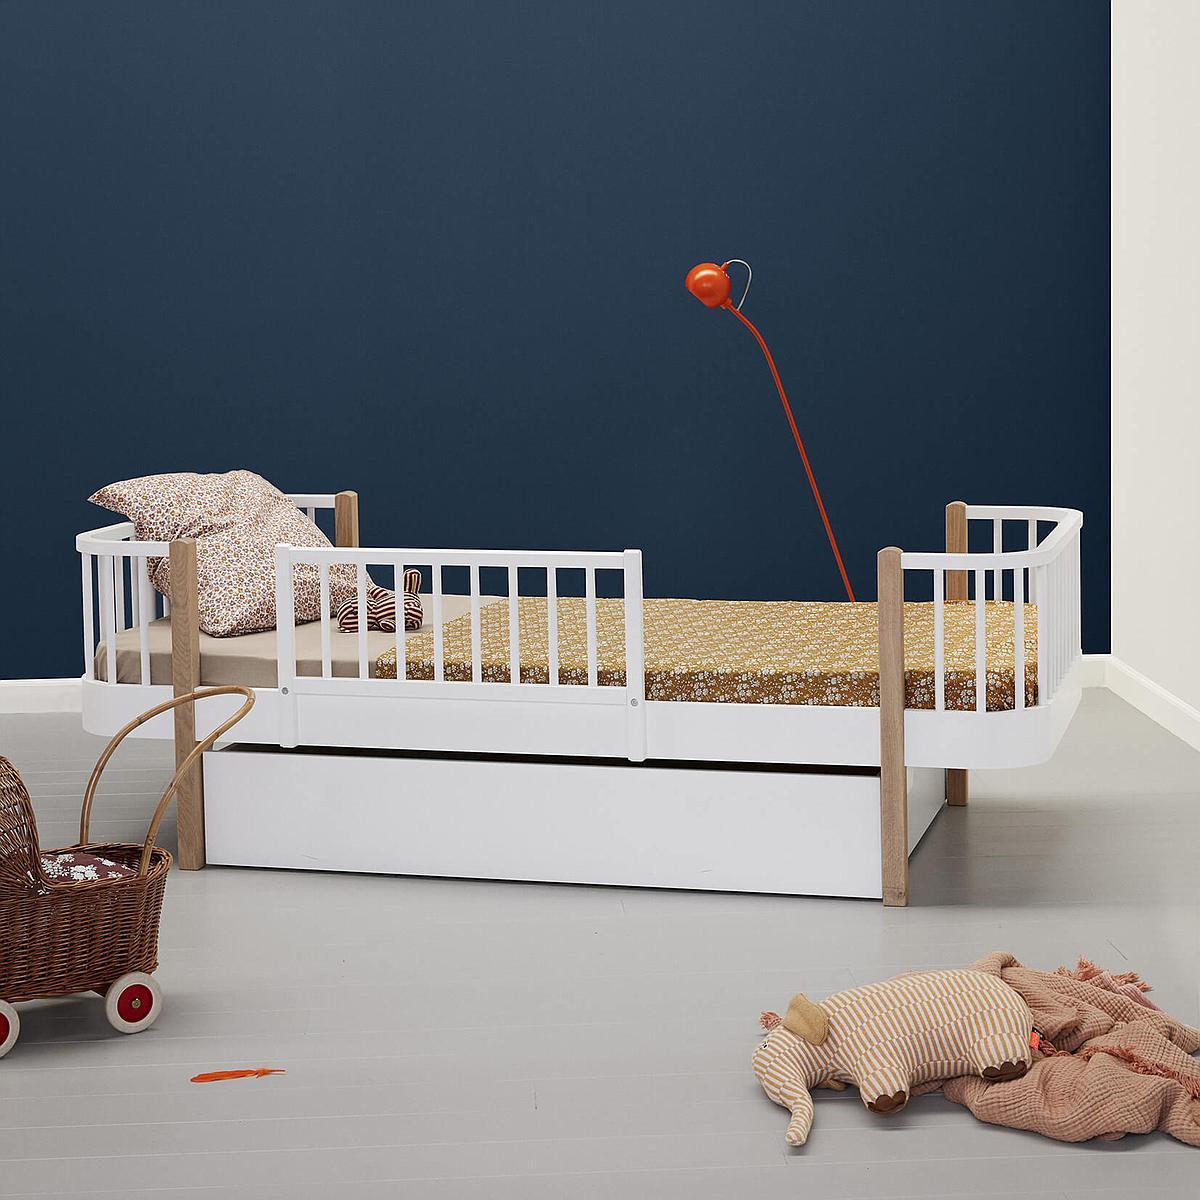 Cajón cama 94x142cm WOOD ORIGINAL Oliver Furniture blanco